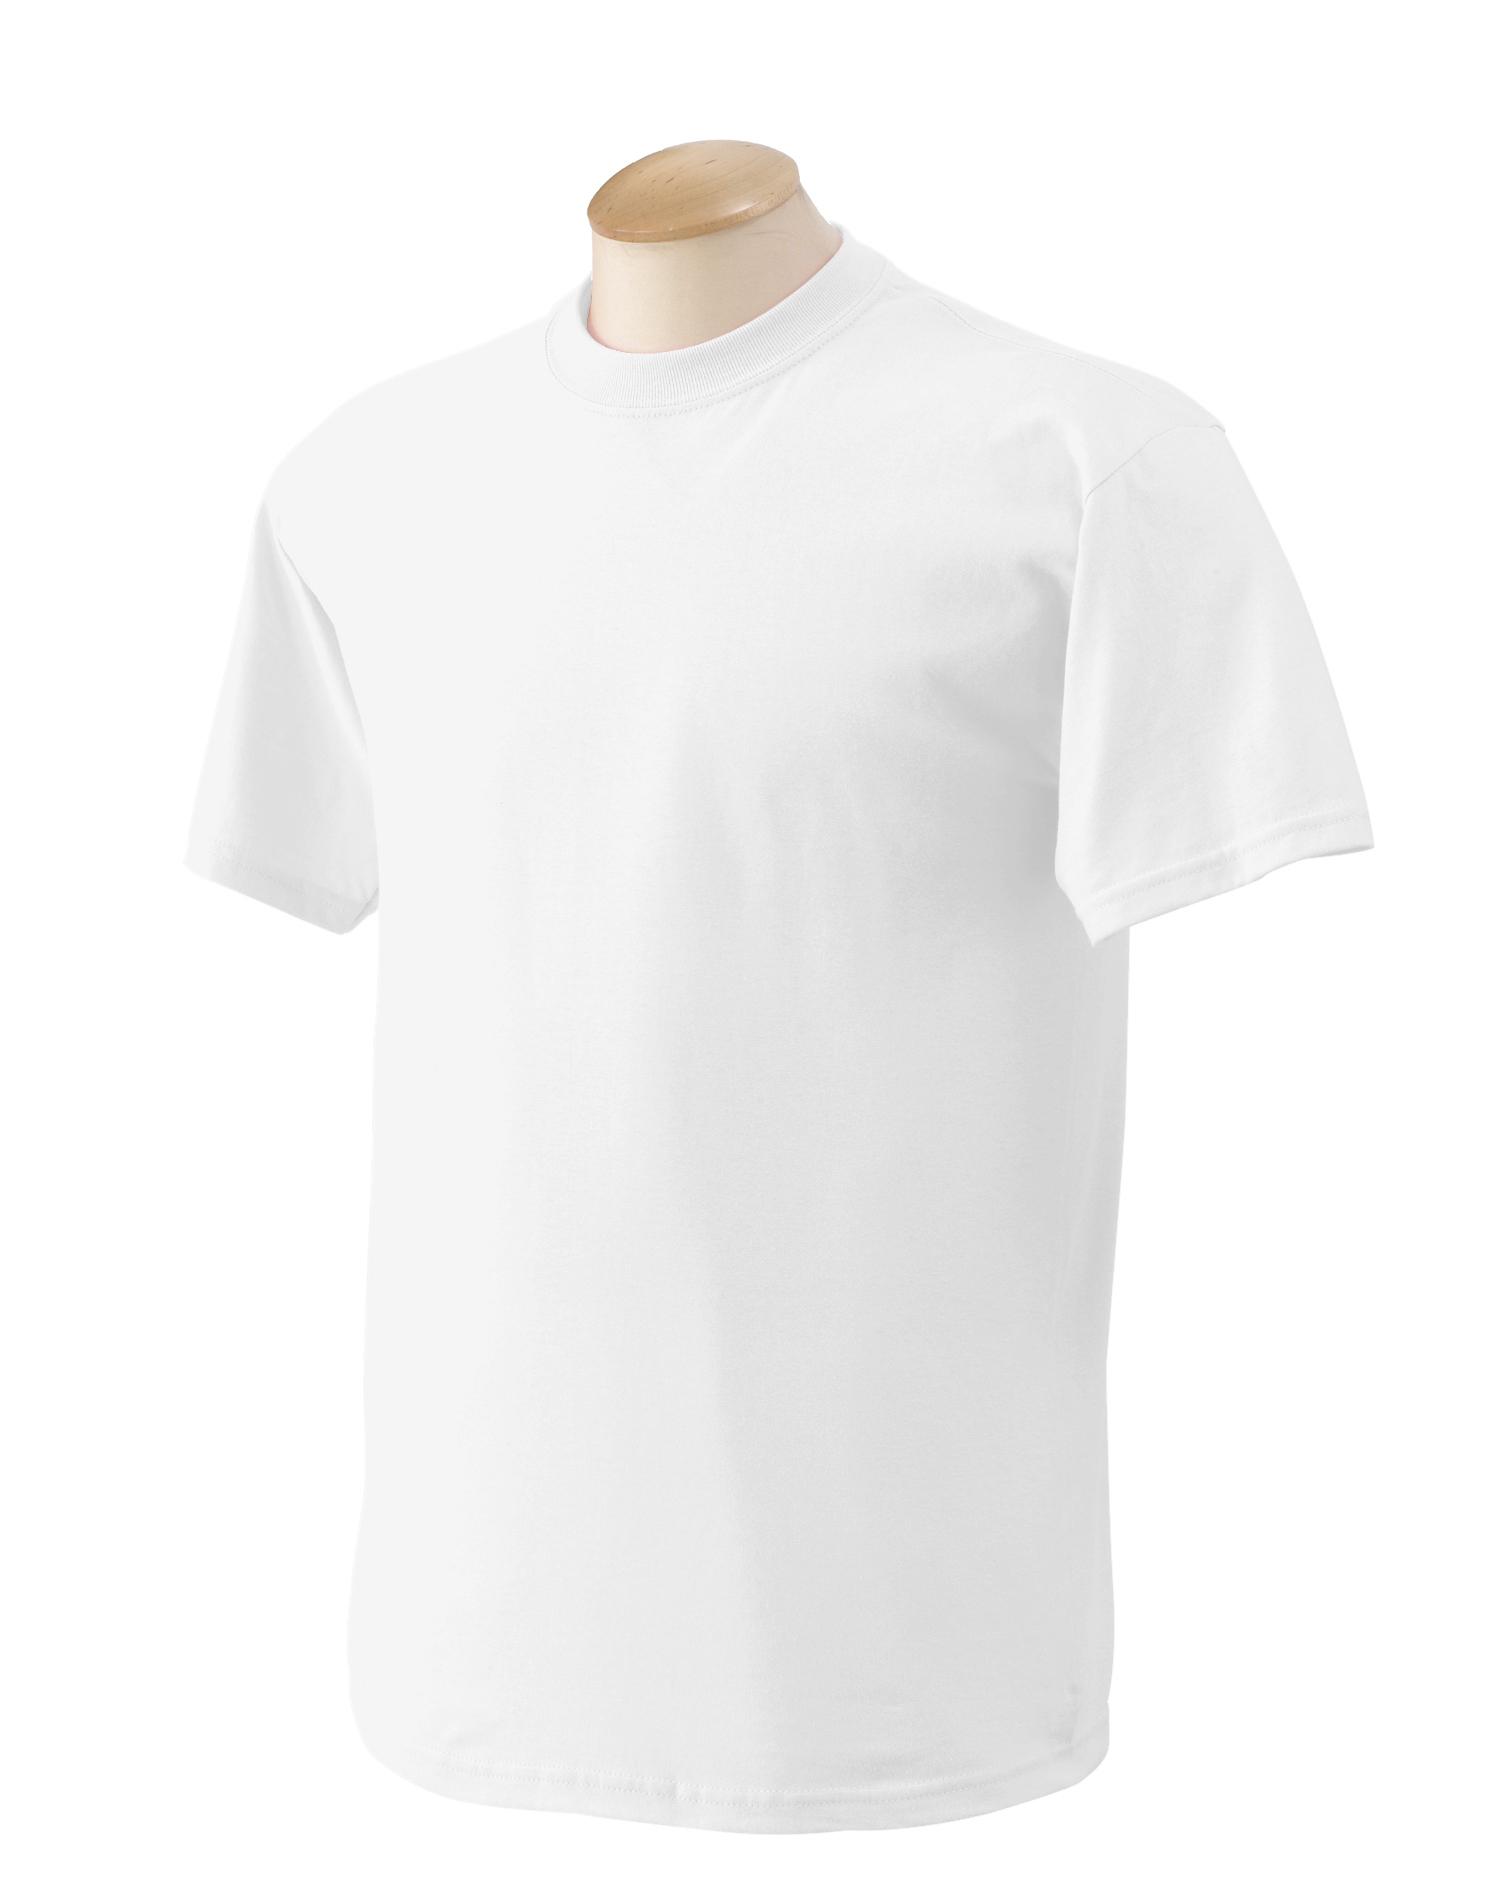 9fc946f0 Buy Adult Heavy Cotton™ 5.3 oz. T-Shirt - Gildan Online at Best ...